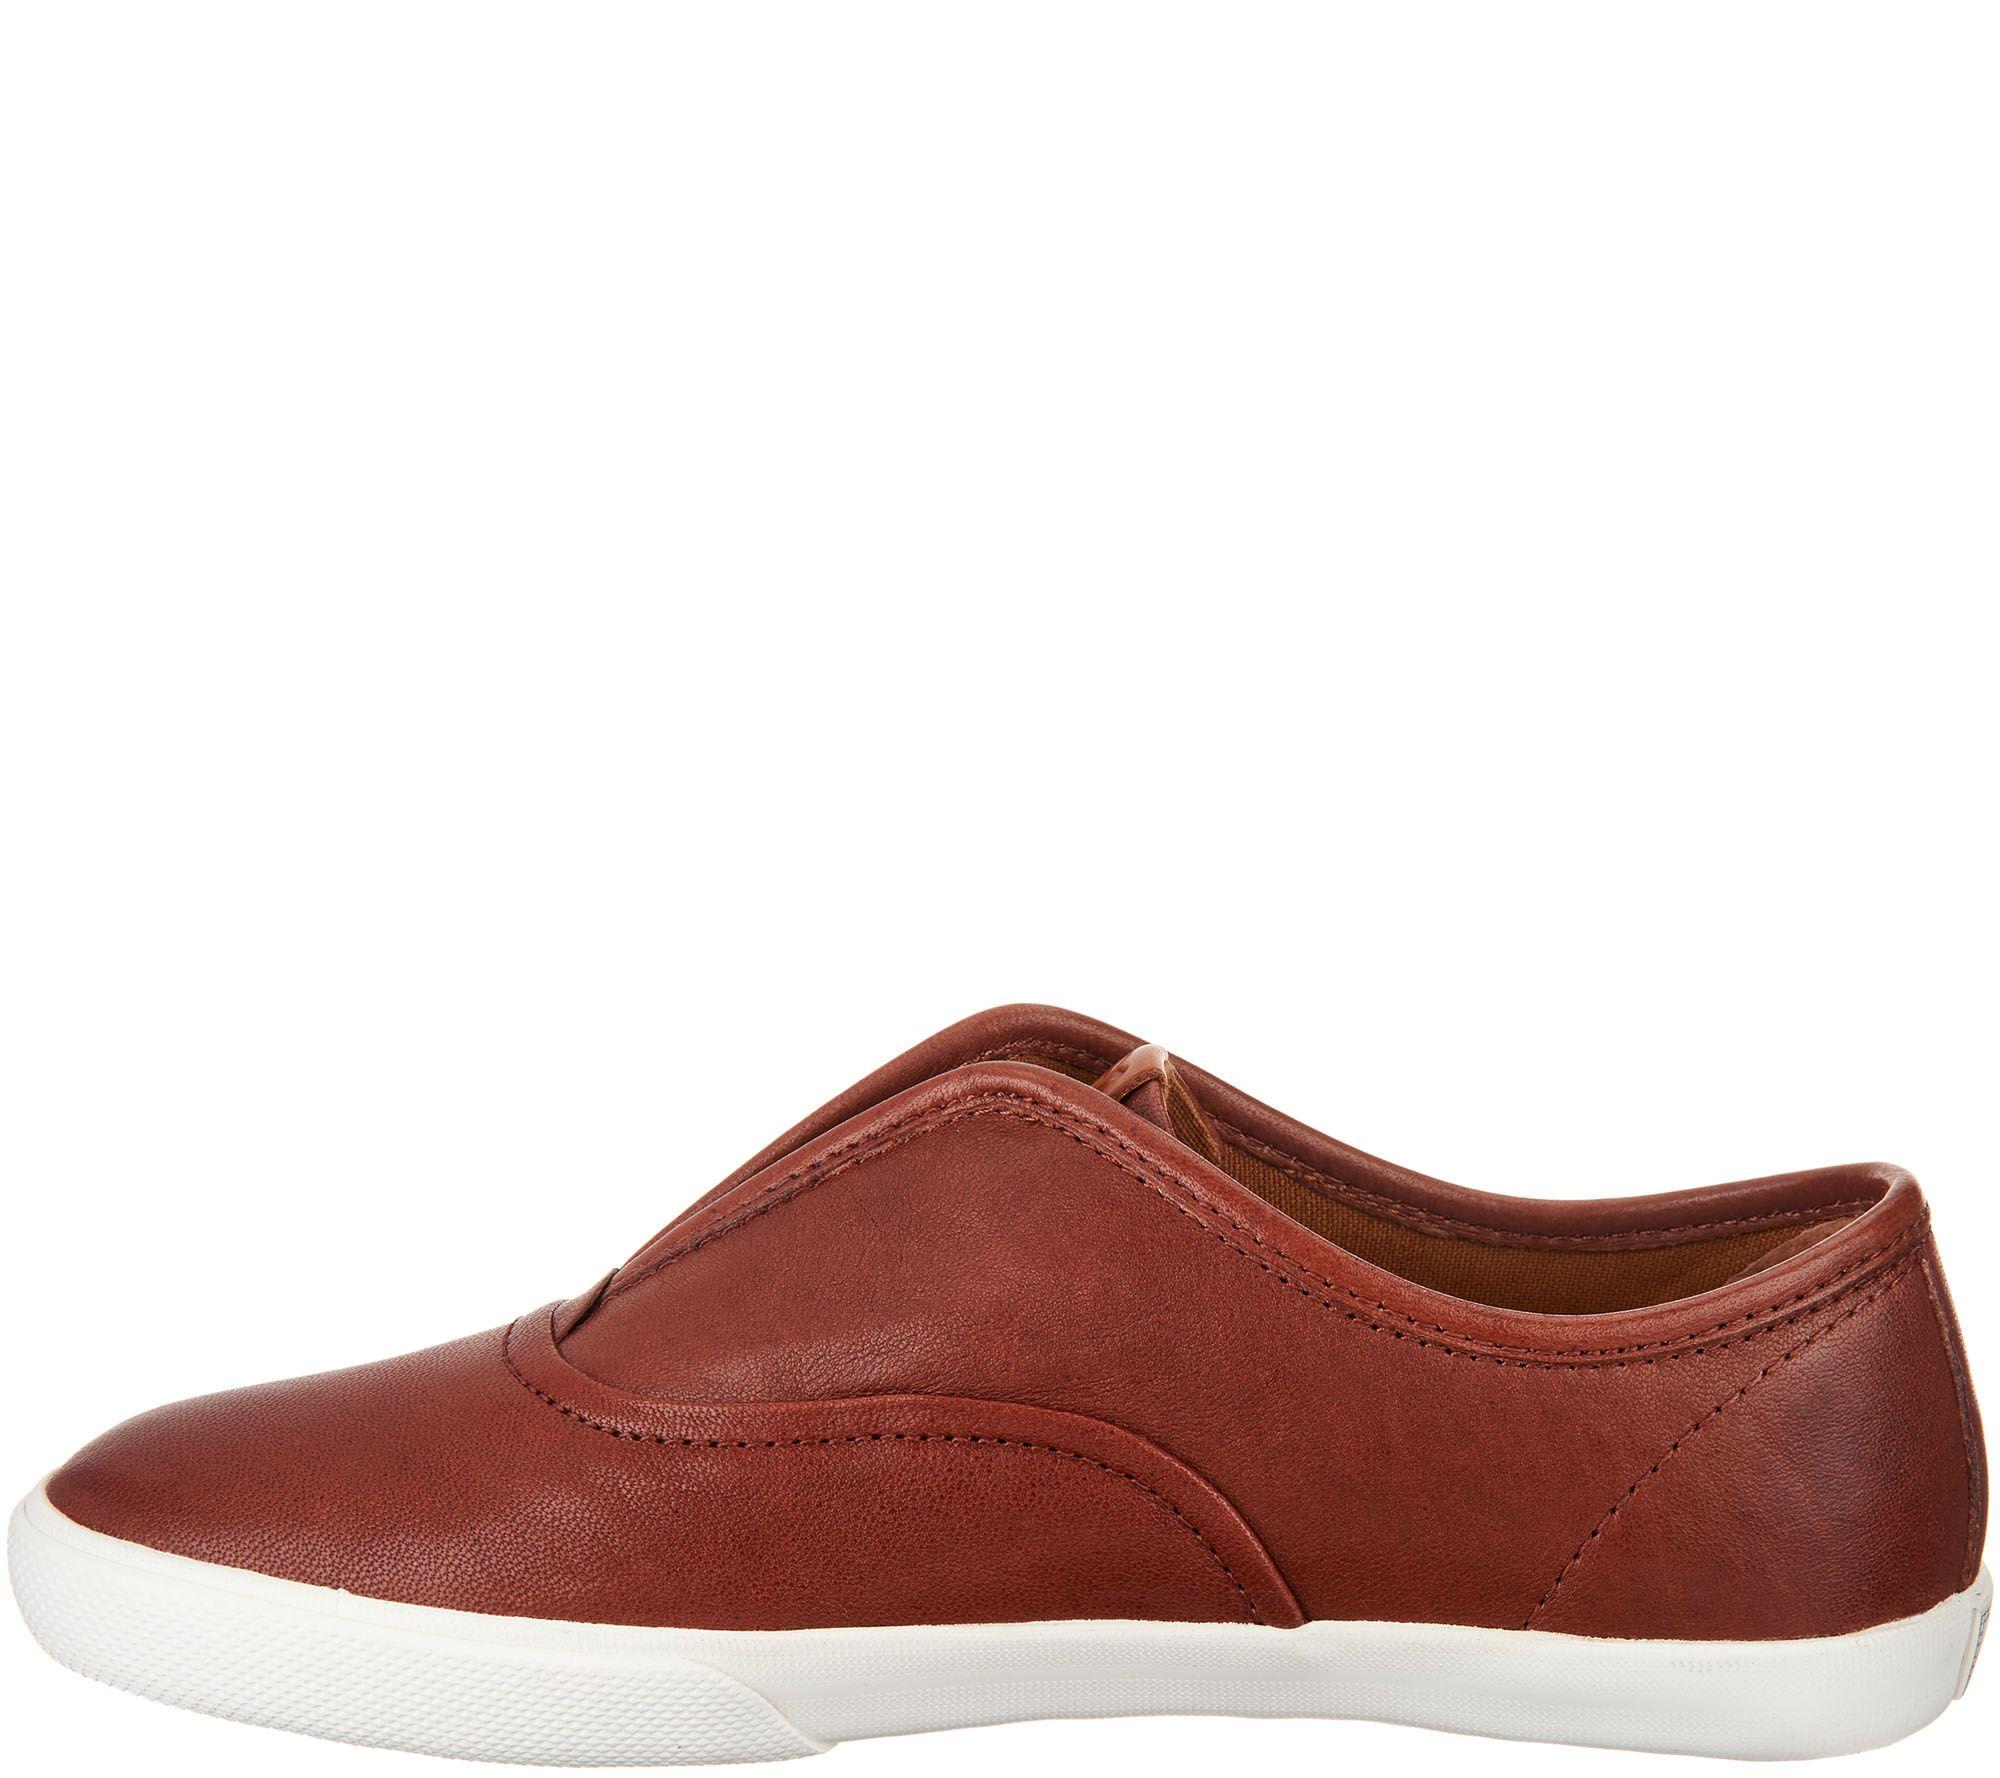 Frye Leather Slip On Sneakers Maya Page 1 Ready Nwt Hobo Brown